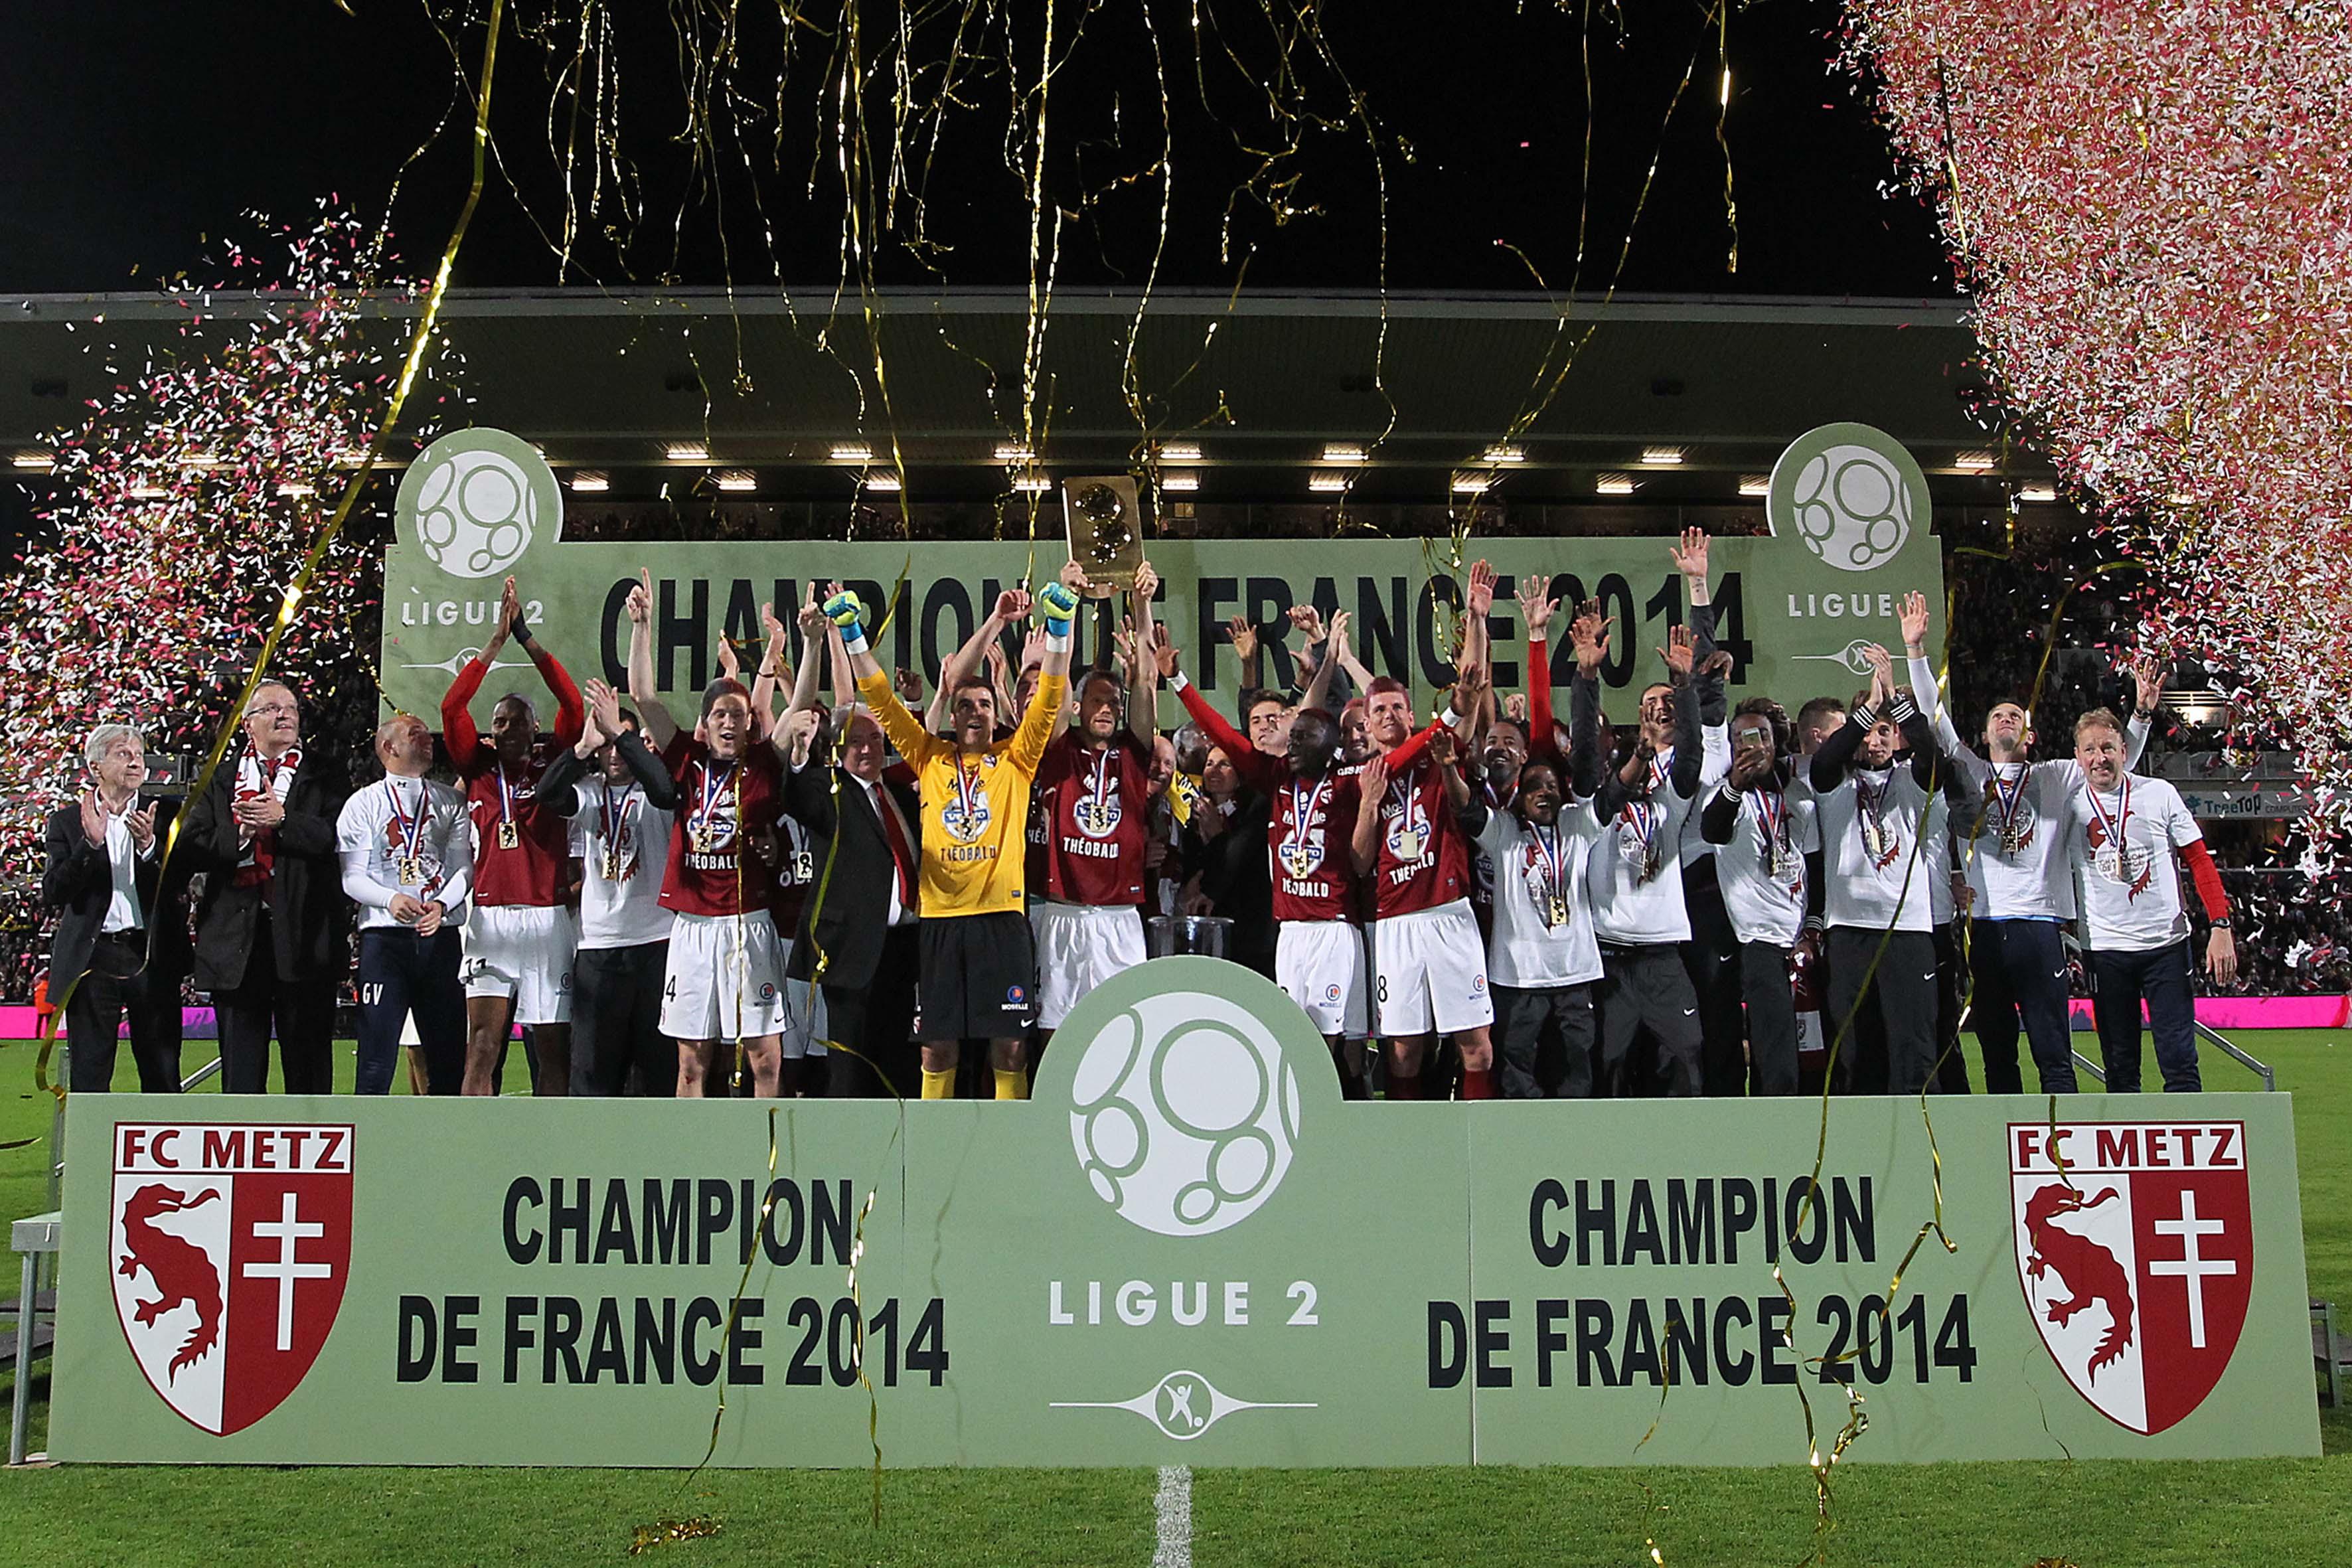 2014_marvaux_metz_champions france_01.jpg